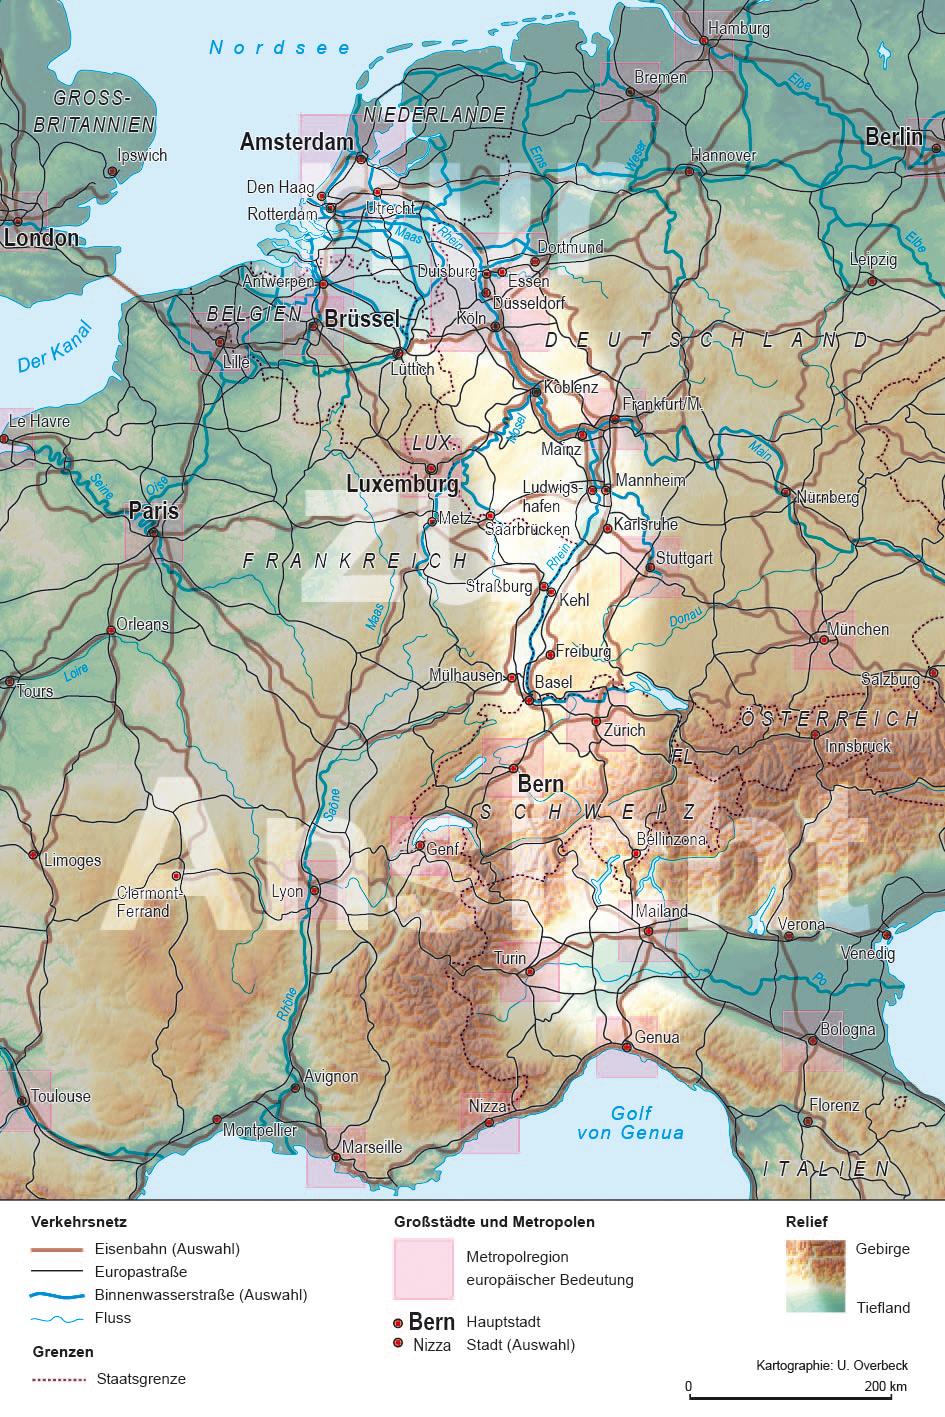 As Karte